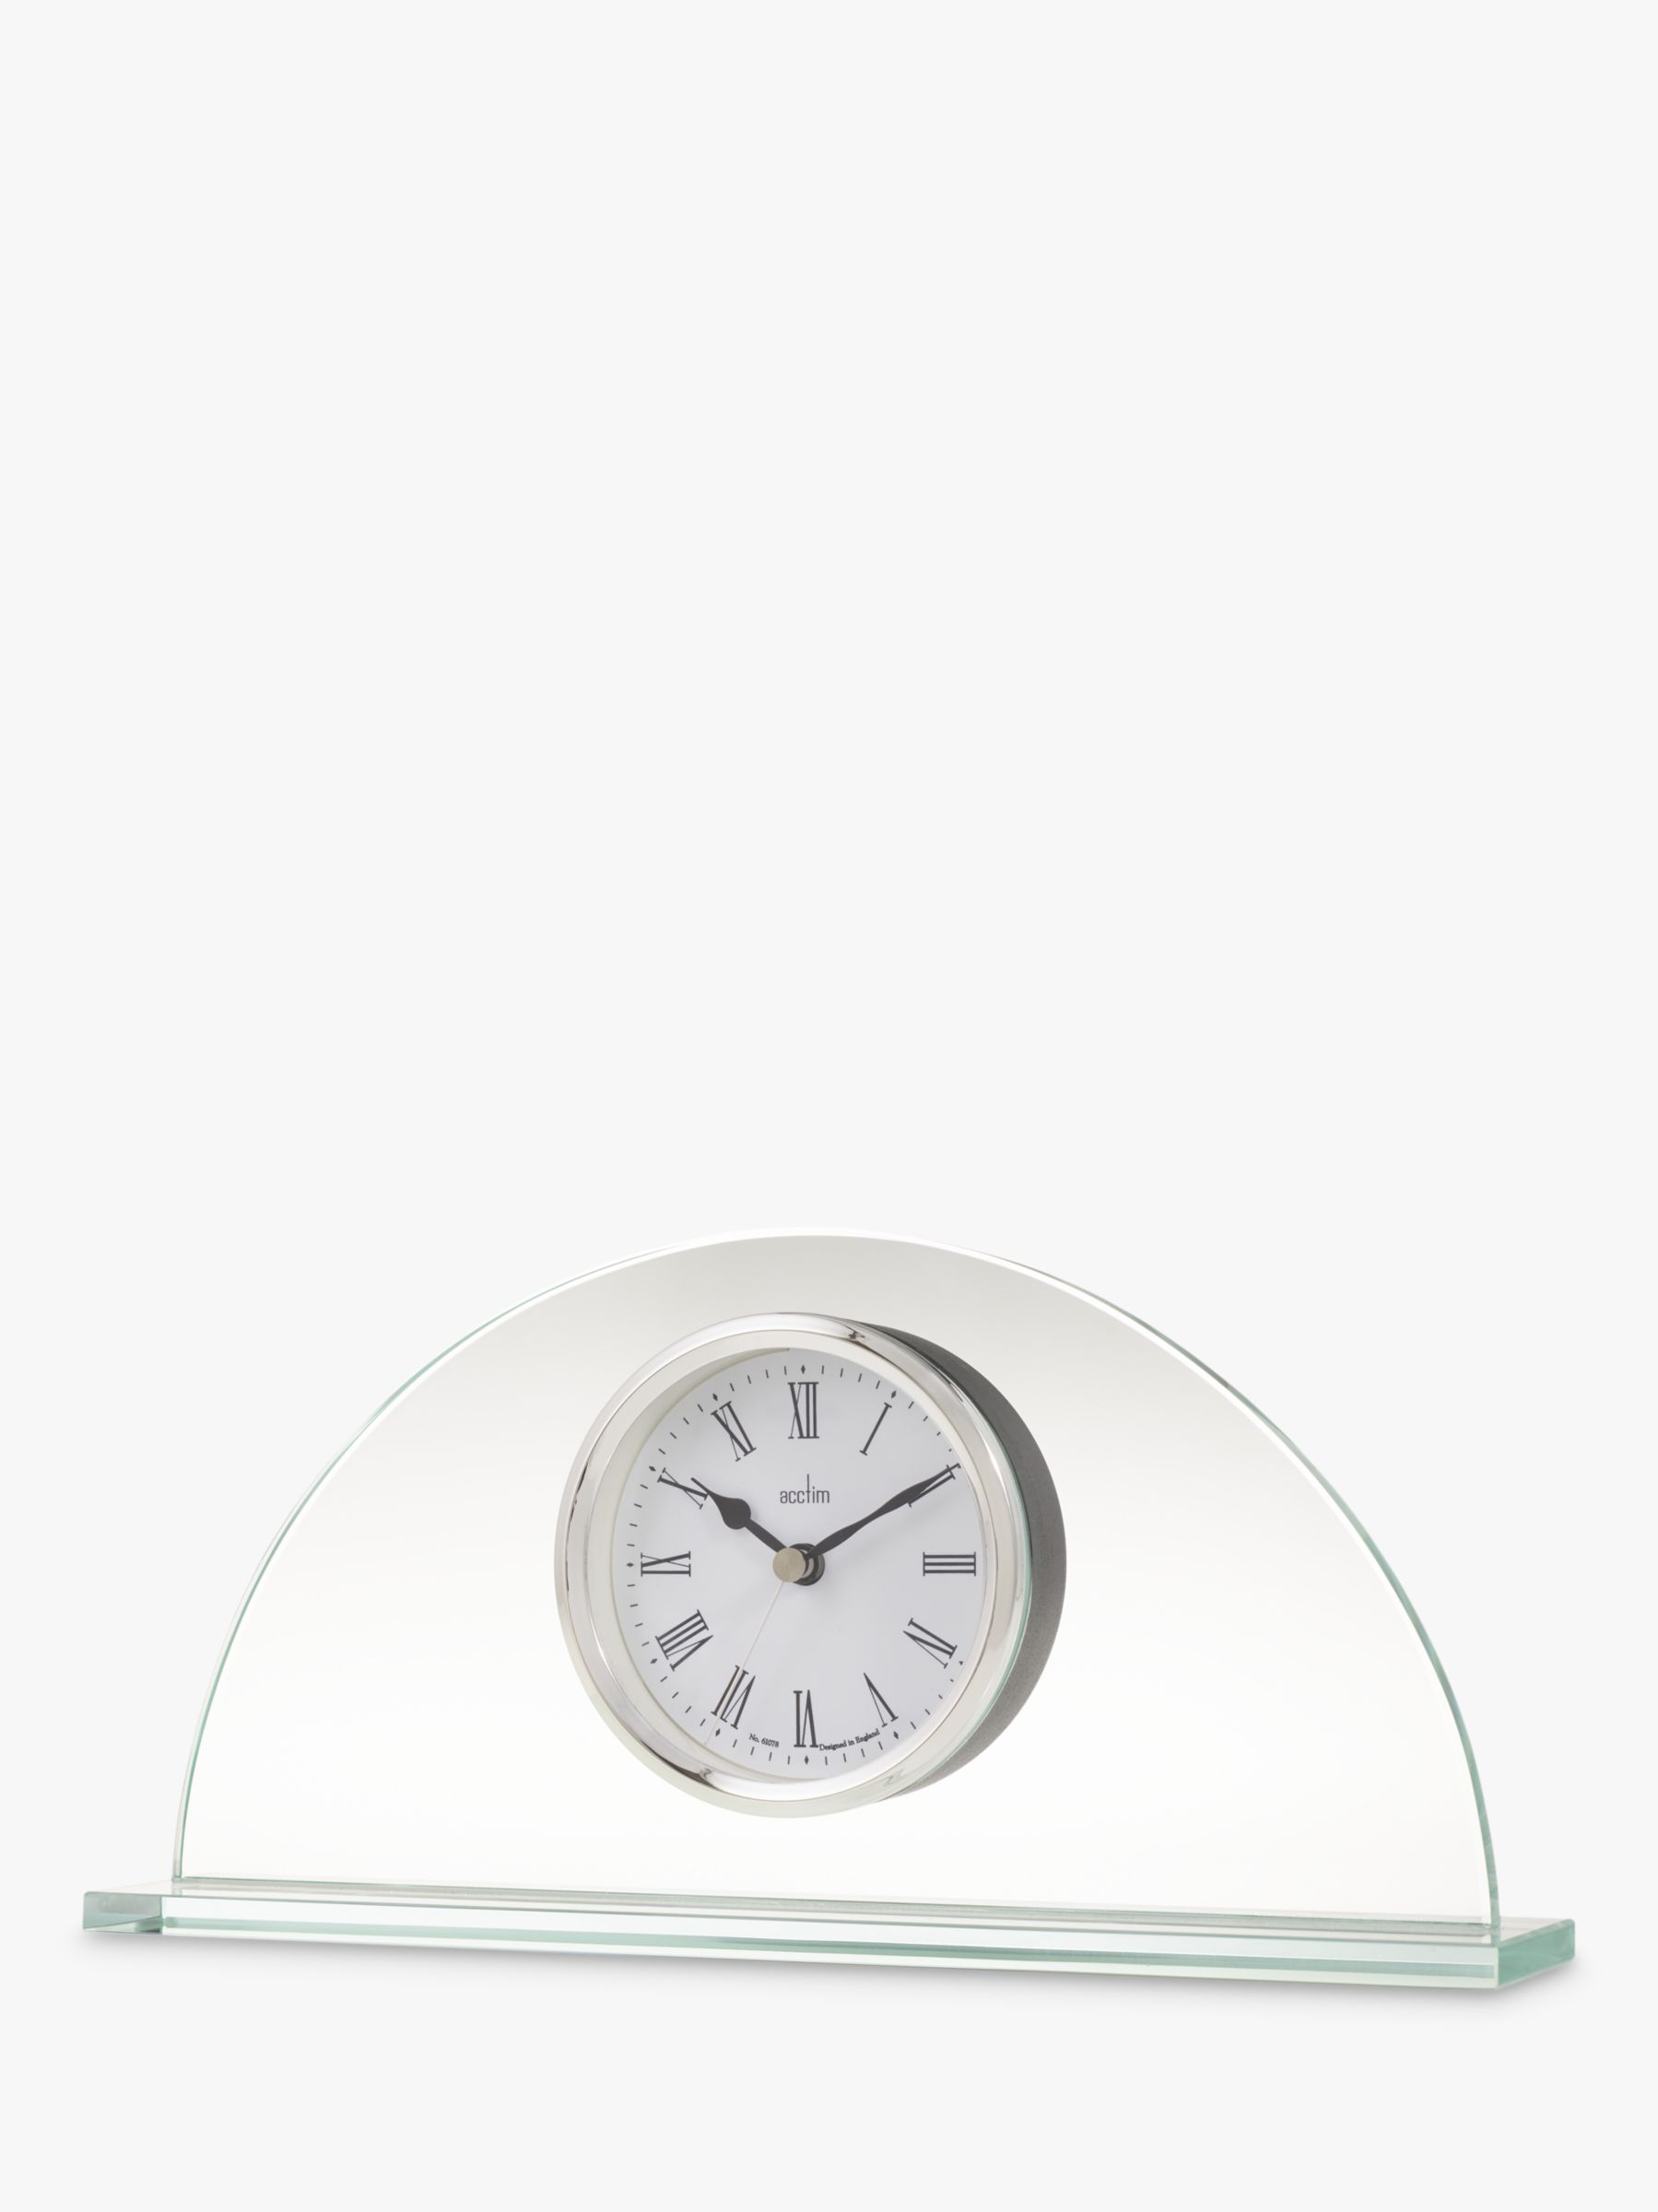 Acctim Acctim Milton Glass Mantel Clock, Clear/Chrome, H13cm